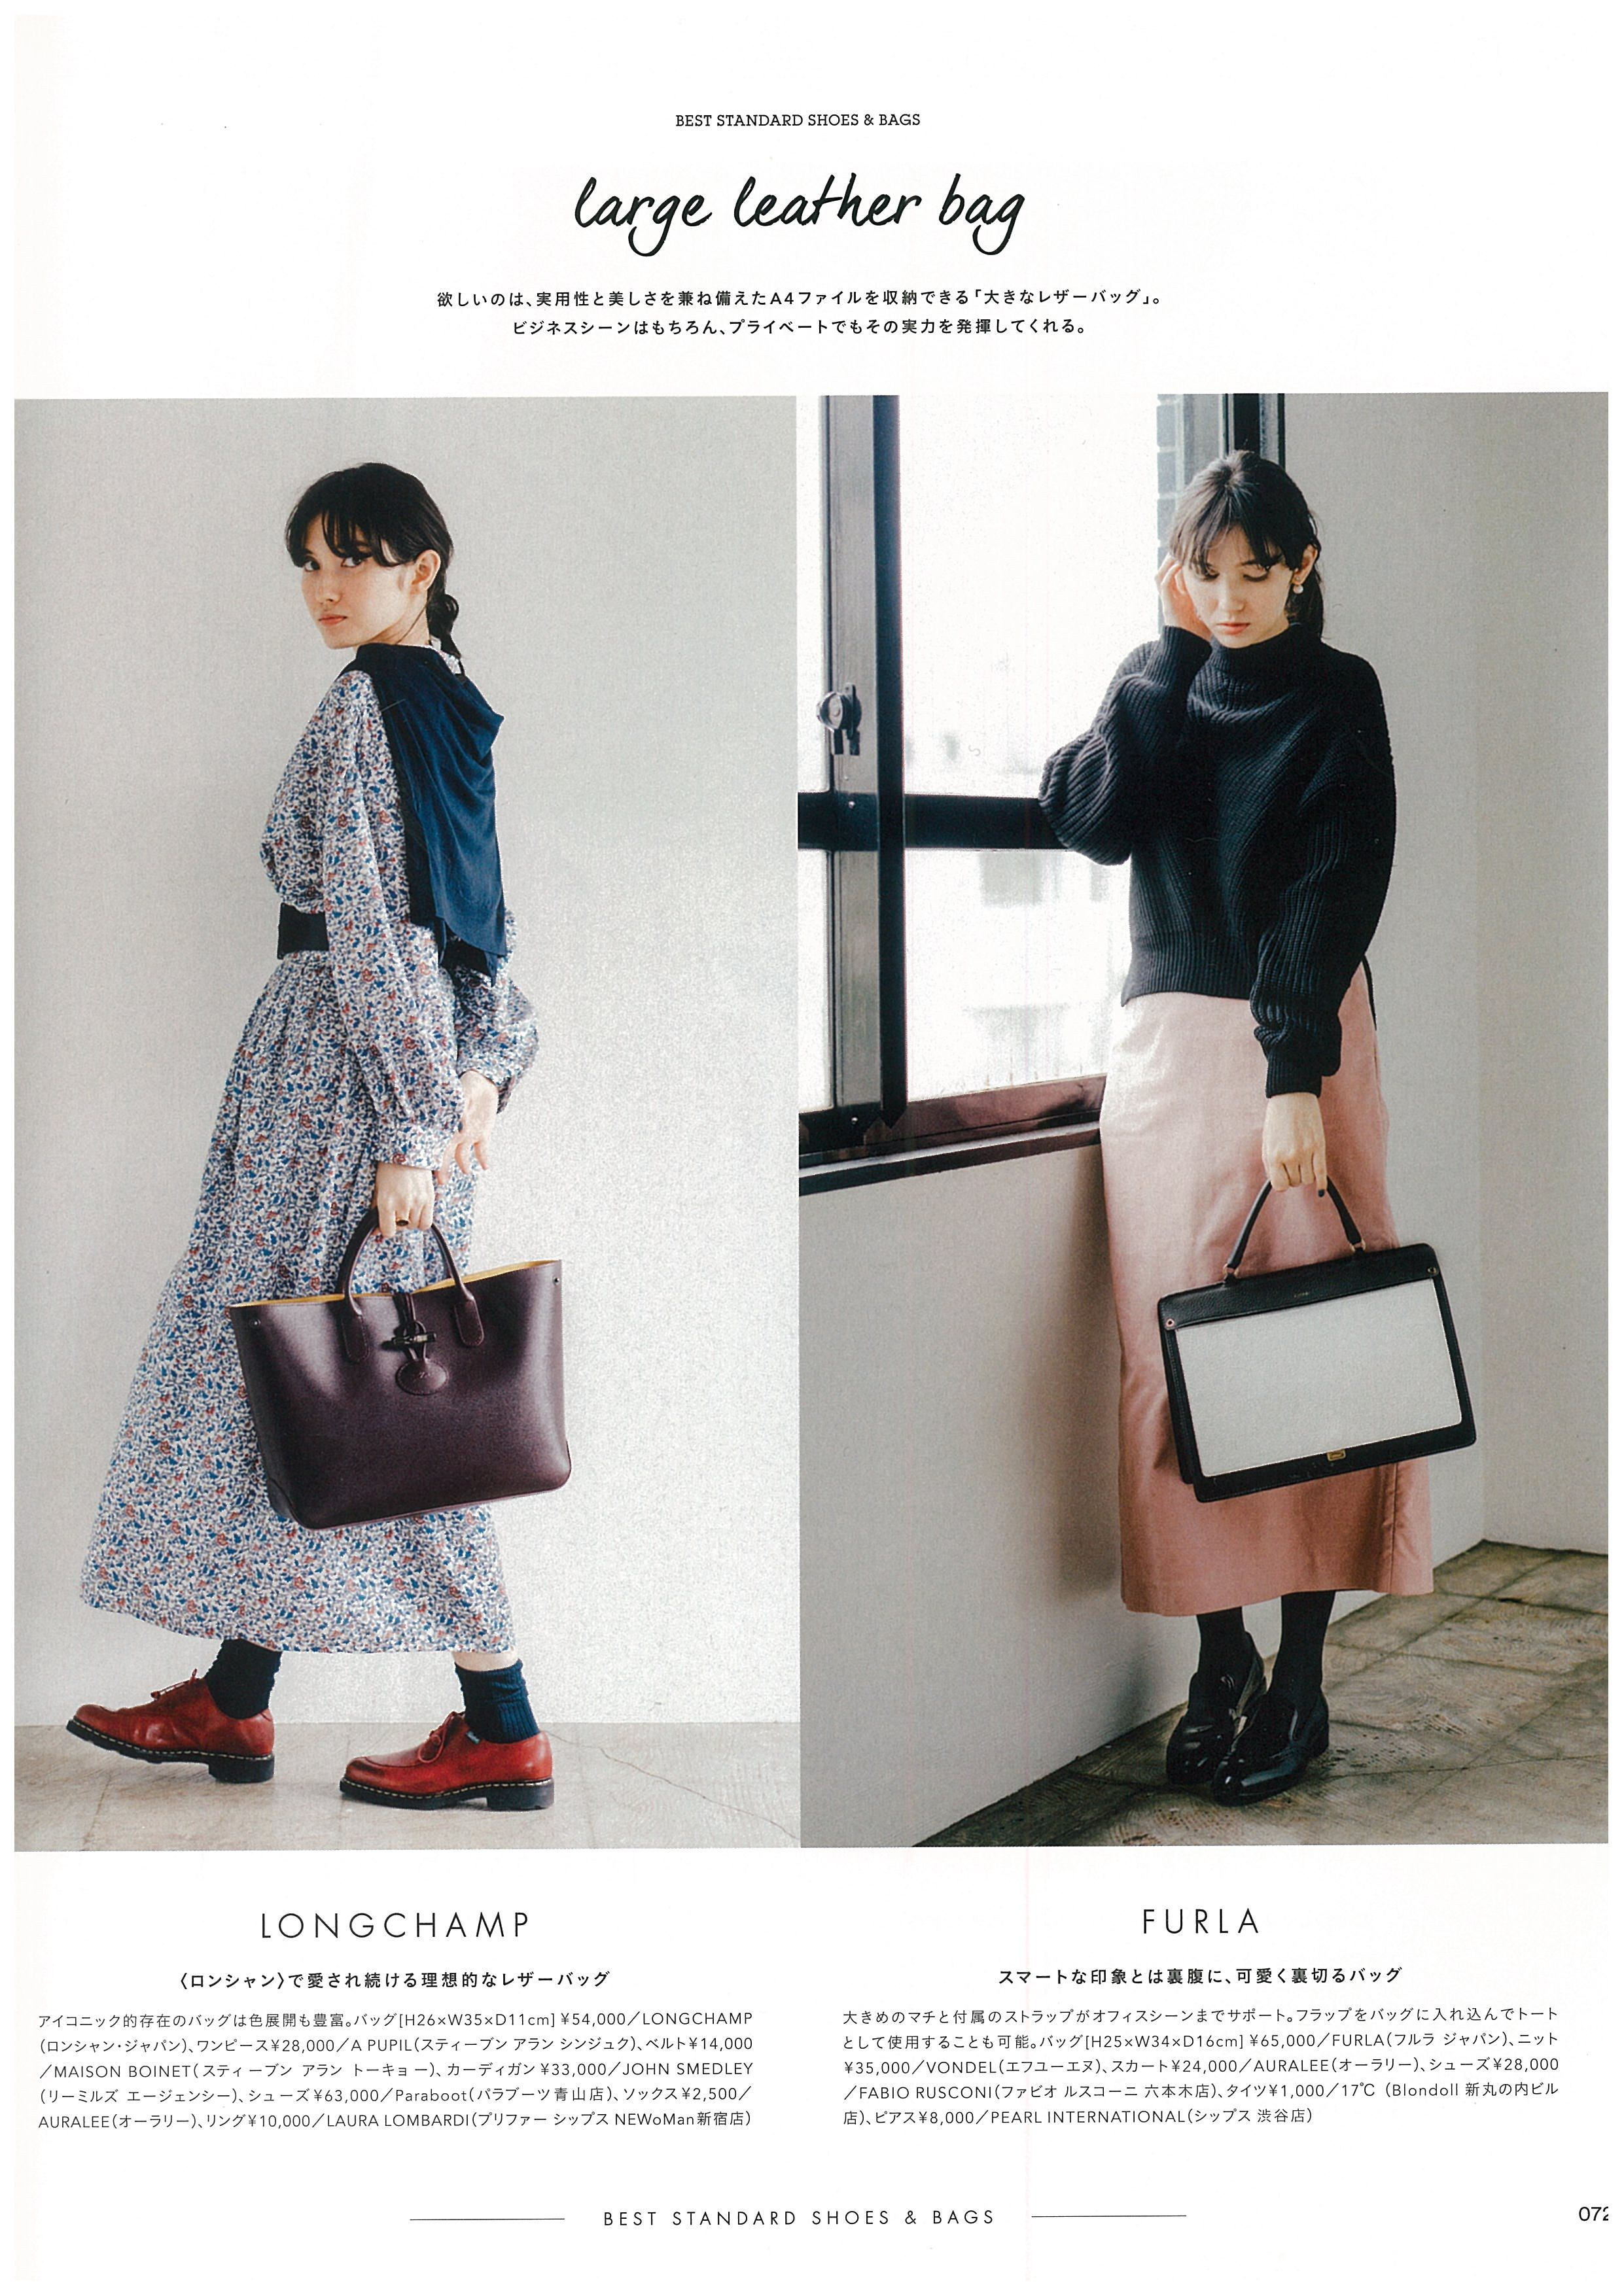 vikka 10 2017 best standard shoes bags 美しい靴 素敵なバッグ ph kimihiko nitta st miyuki sawada hm megumi kato m saya ichikawa ed harumi hino chips